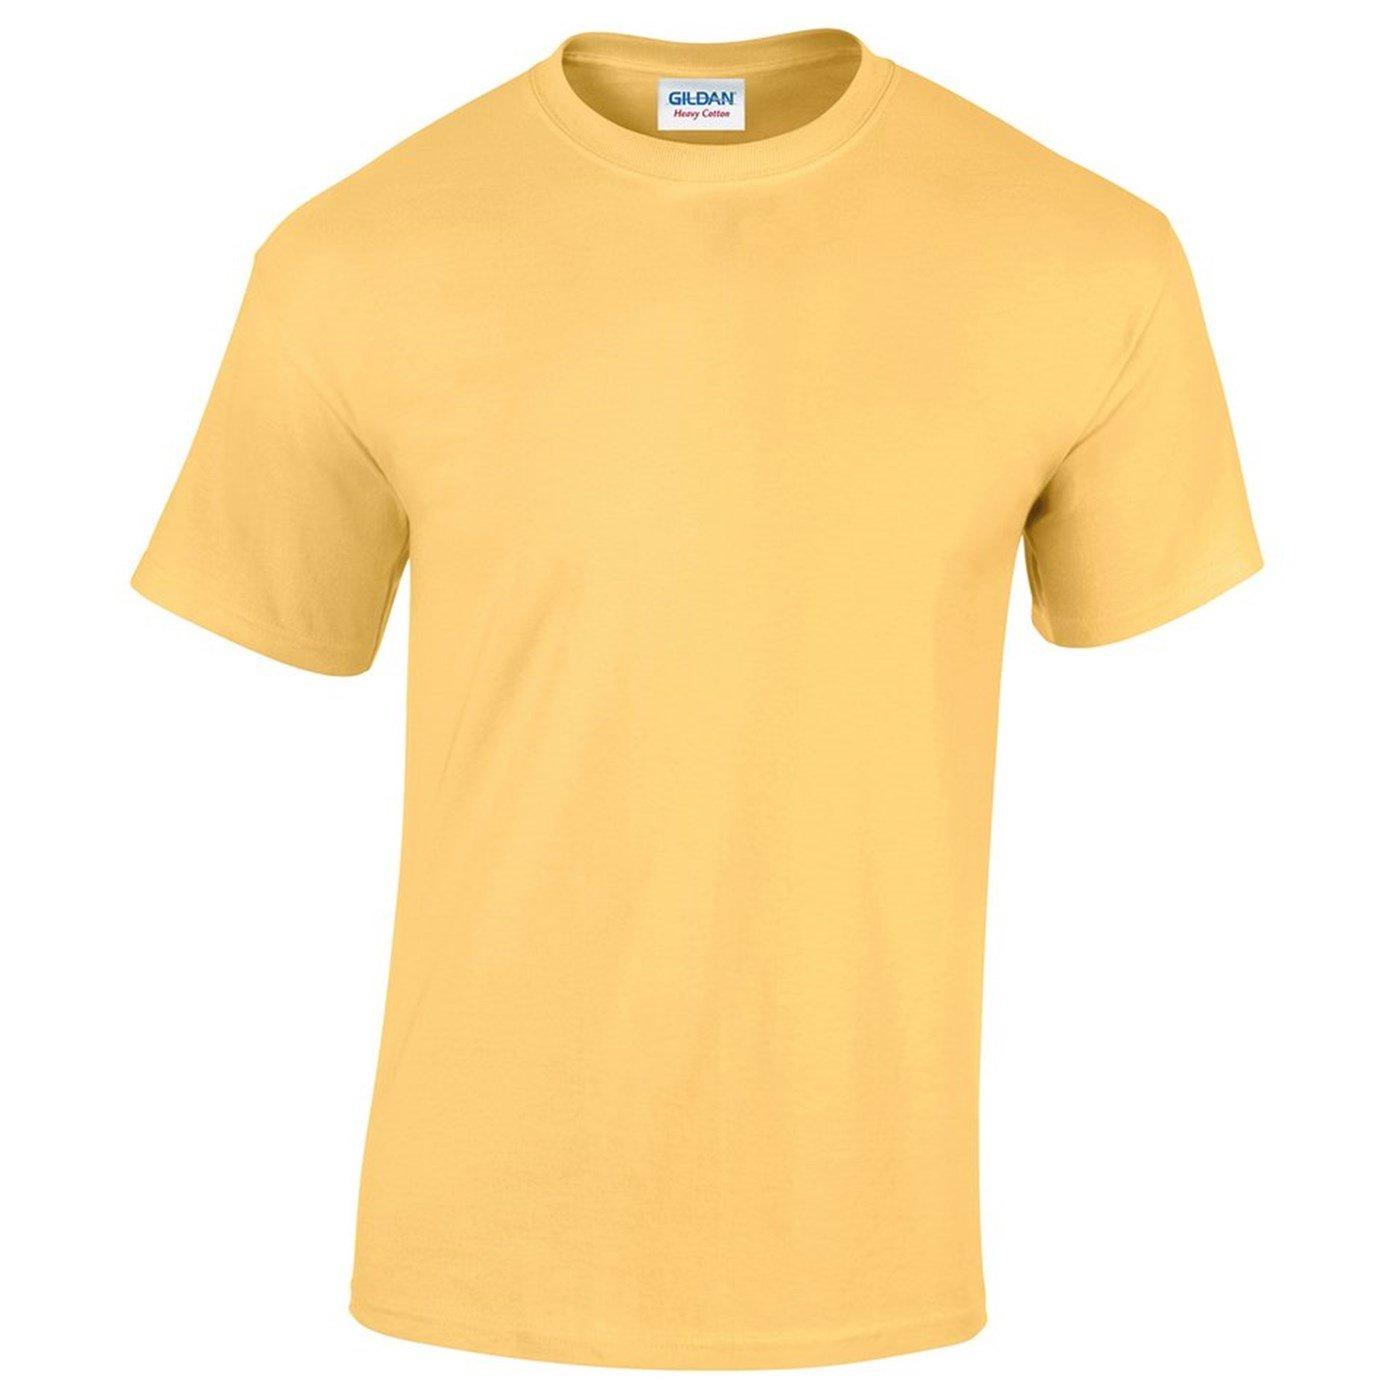 6a363728e8a Gildan Adult s Heavy Cotton T-shirt GD005